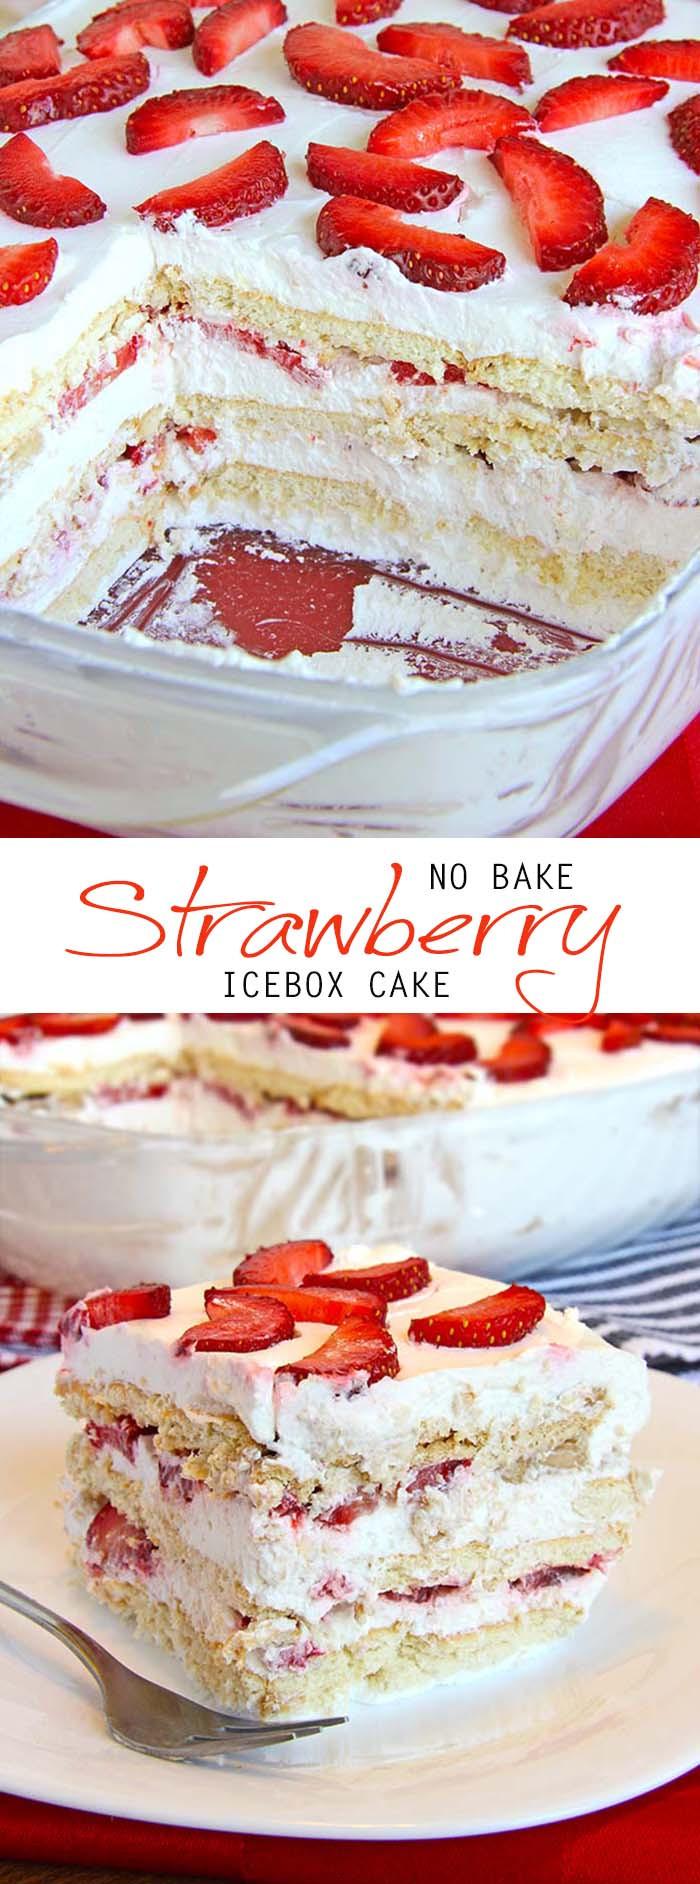 Easy Summer Dessert Recipes  No Bake Strawberry Icebox Cake Cakescottage